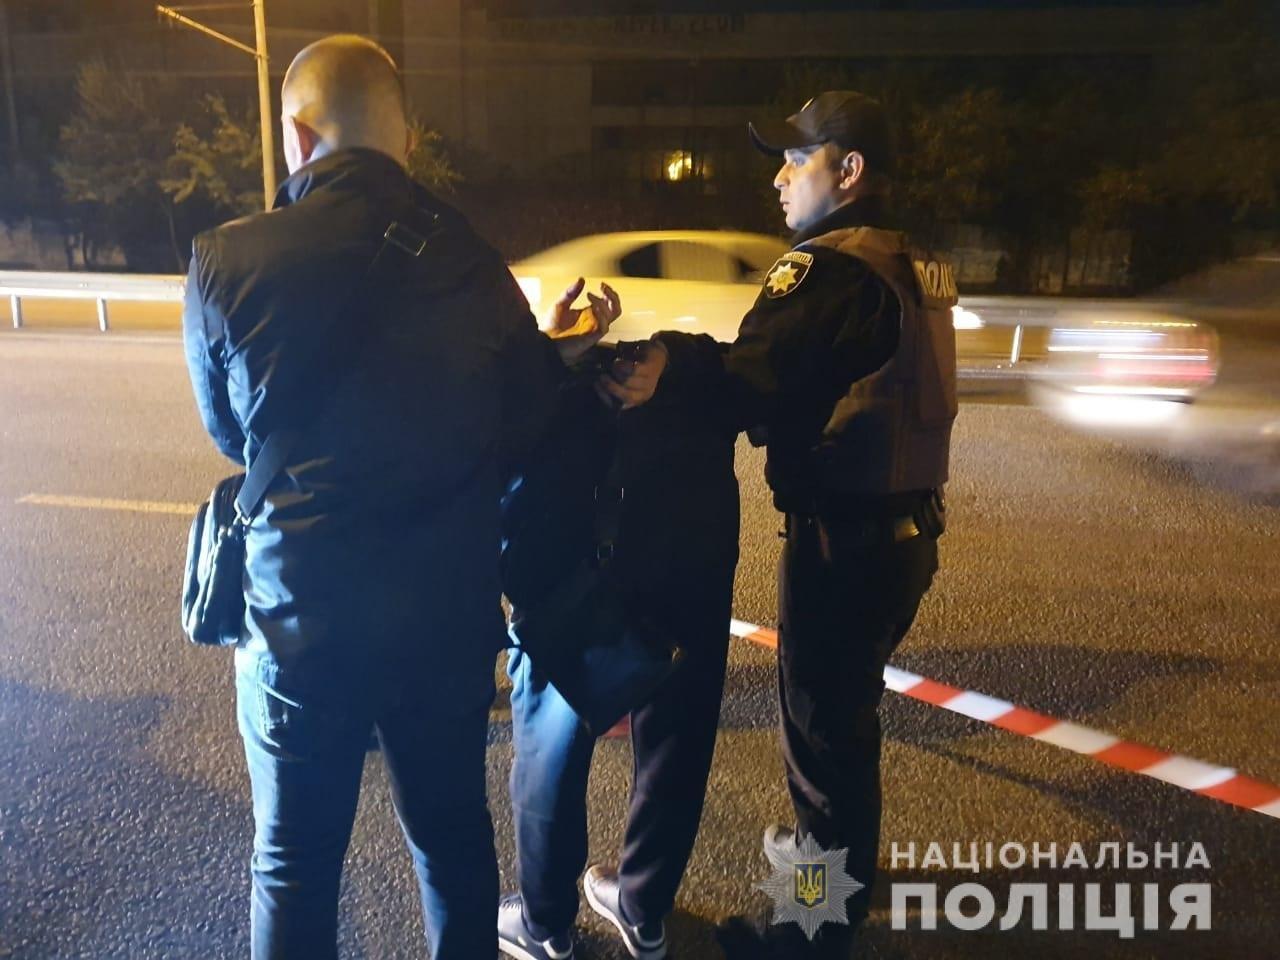 Убийство на Набережной в Днепре: все подробности, - ФОТО, фото-3